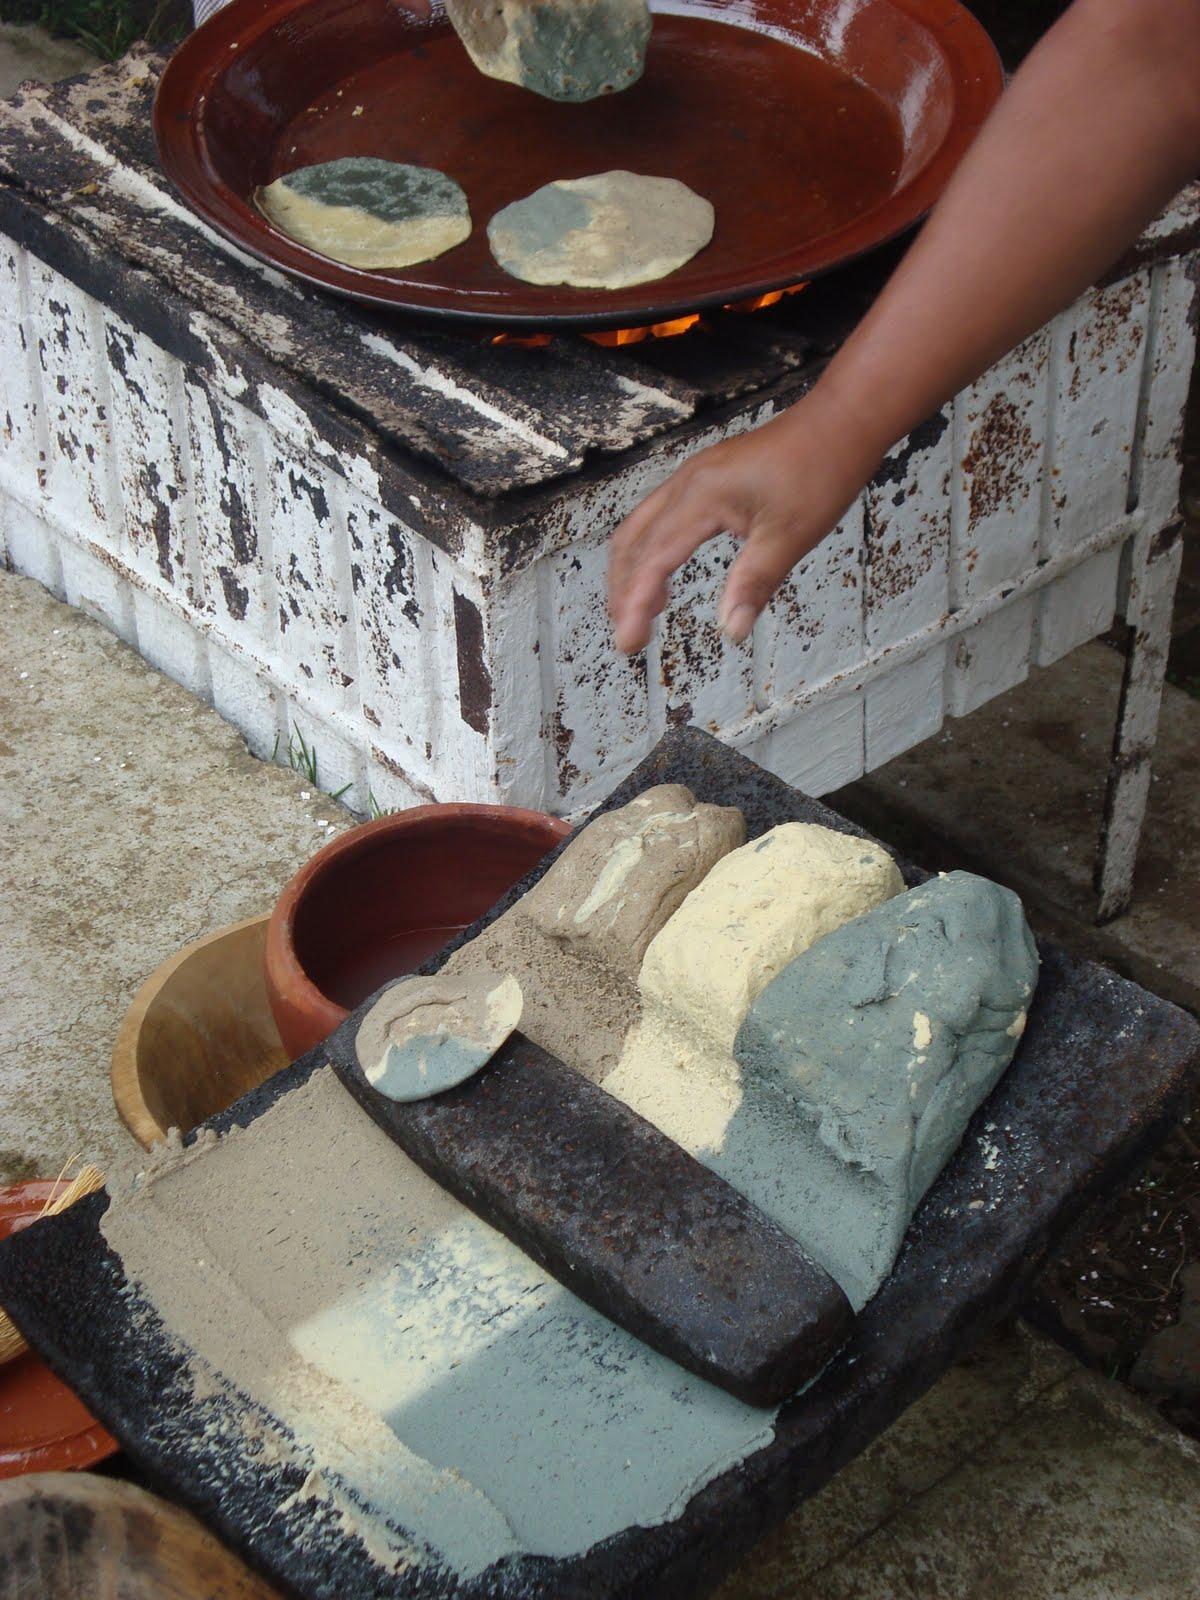 Muebles Nahuatzen Michoacan - Comunidad Indigena[mjhdah]https://lookaside.fbsbx.com/lookaside/crawler/media/?media_id=1602301826458213